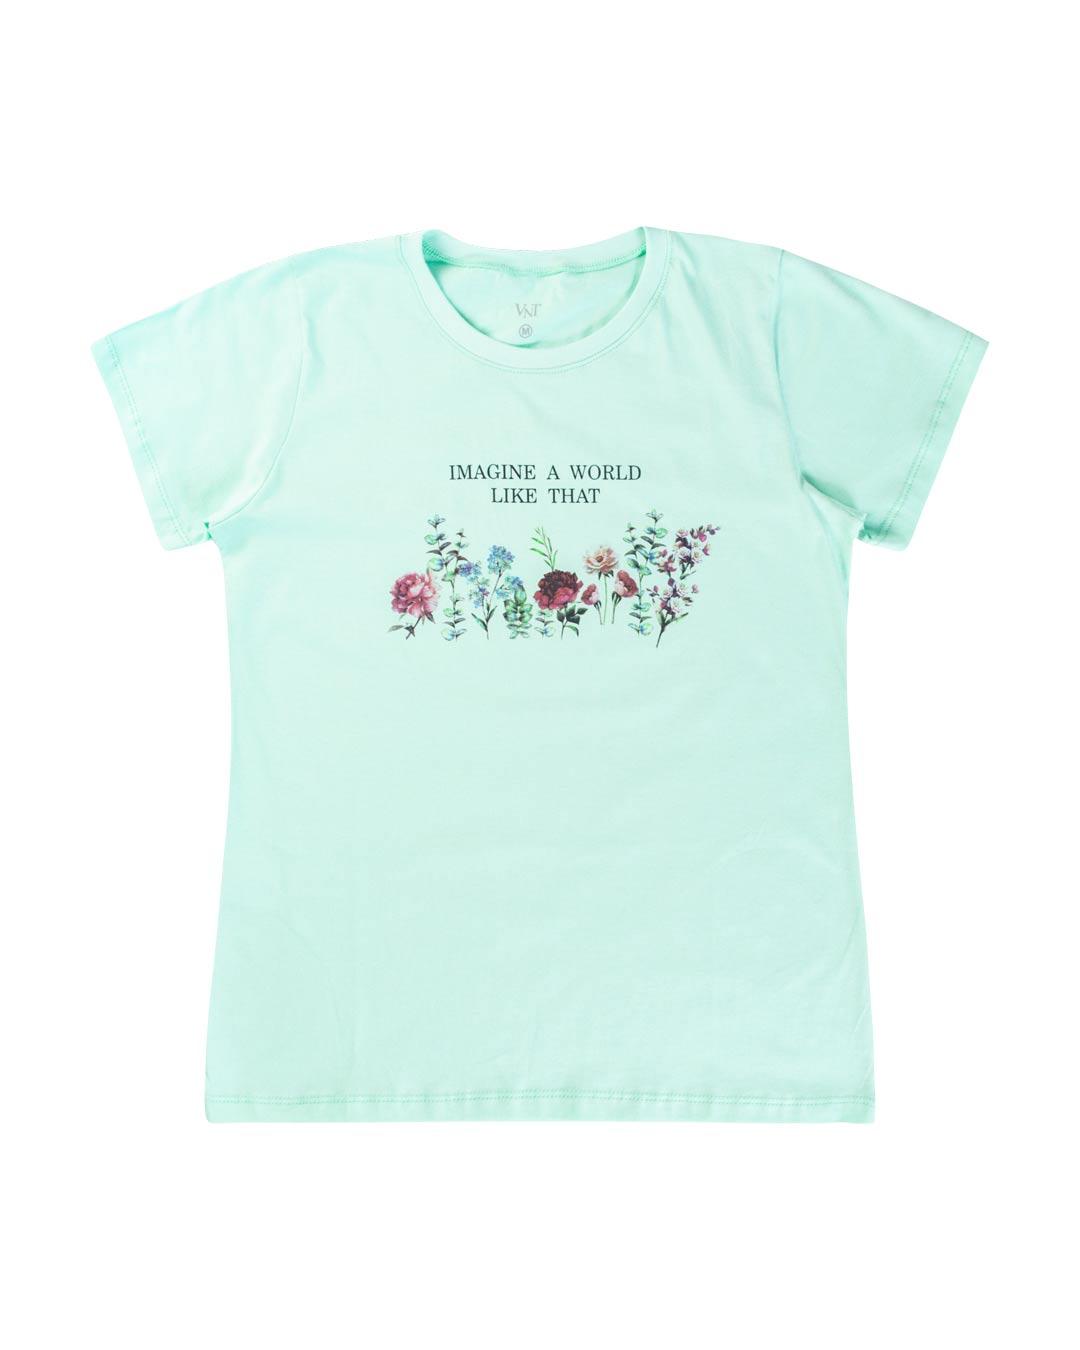 T-Shirt Adulta e Plus Size Imagine A World Like That - Santa Margô